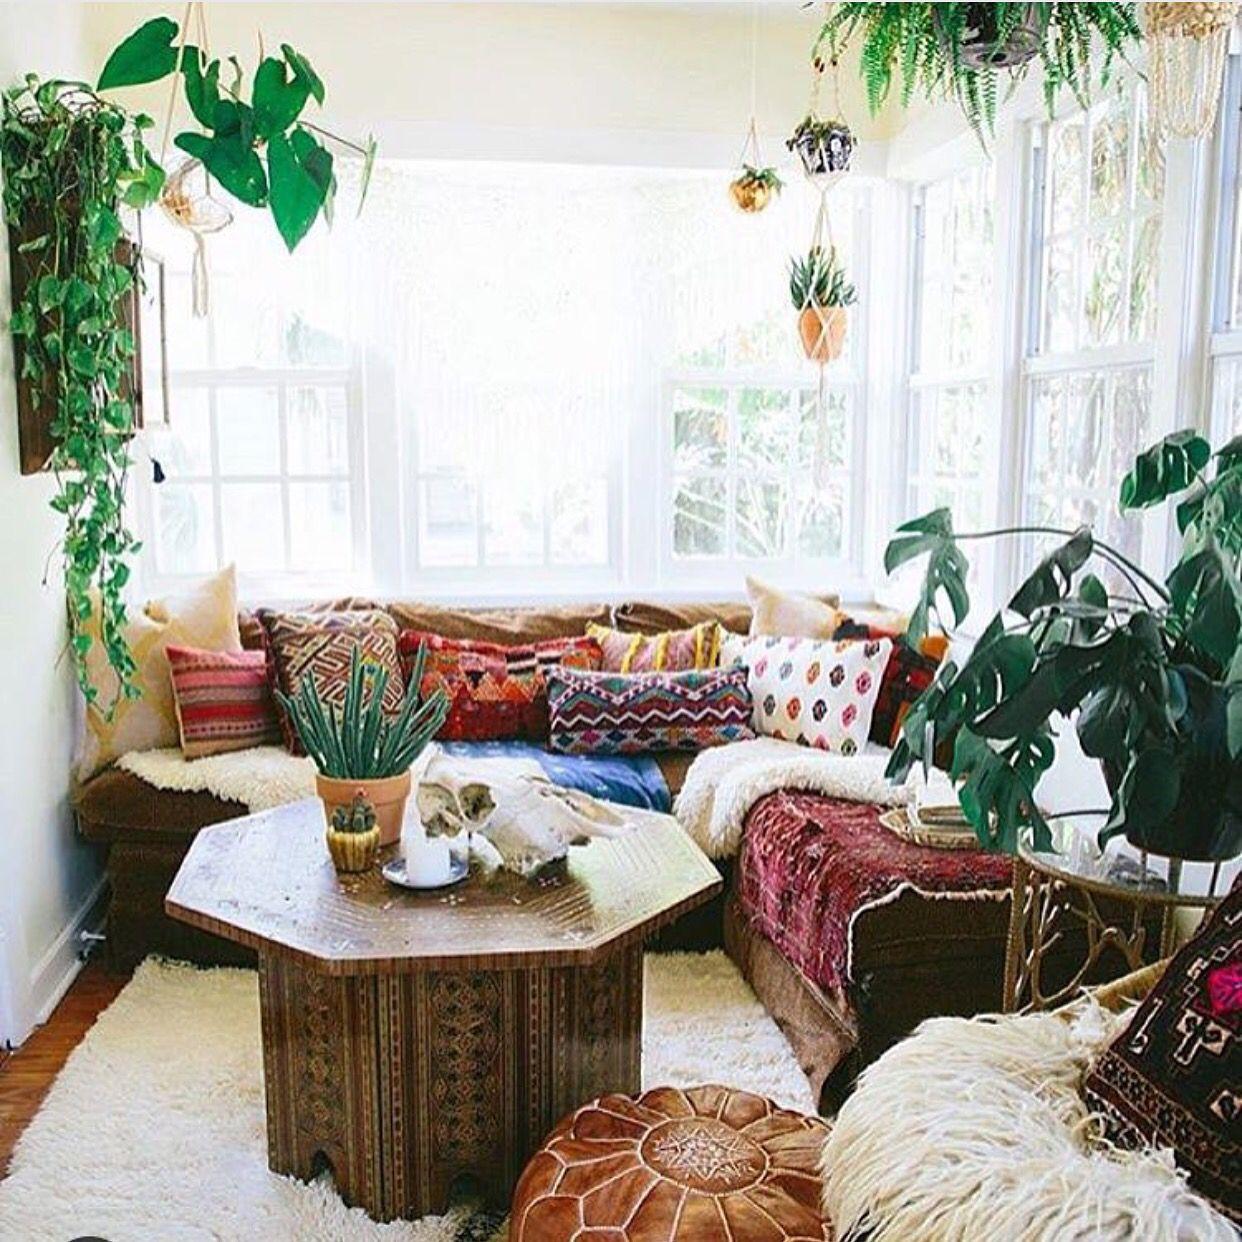 Easy like Sunday morning ⛅ #sundays #welcomehome #loungespot via ...